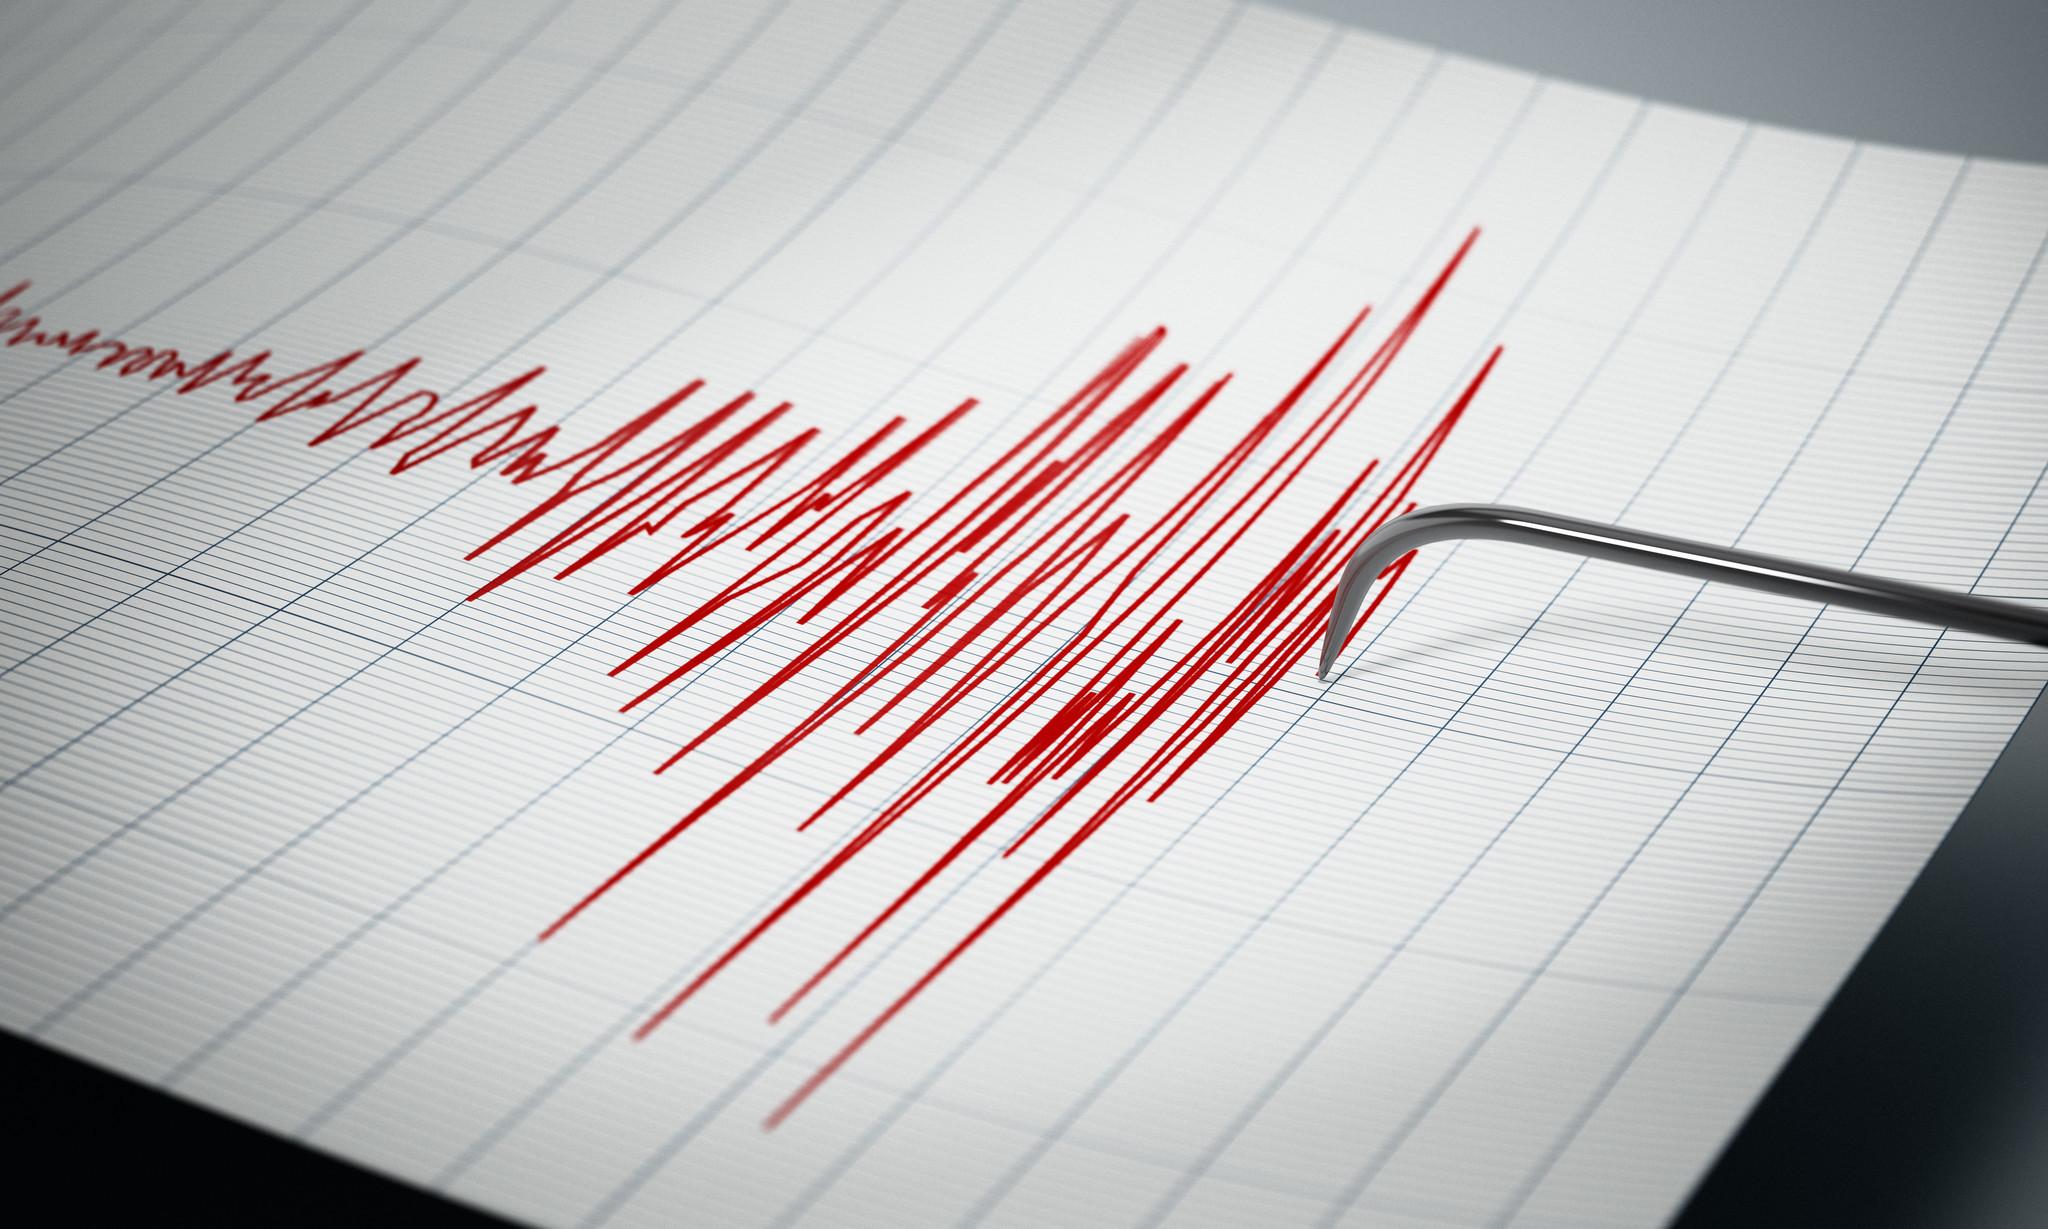 Northern California coast hit by magnitude 5.9 earthquake